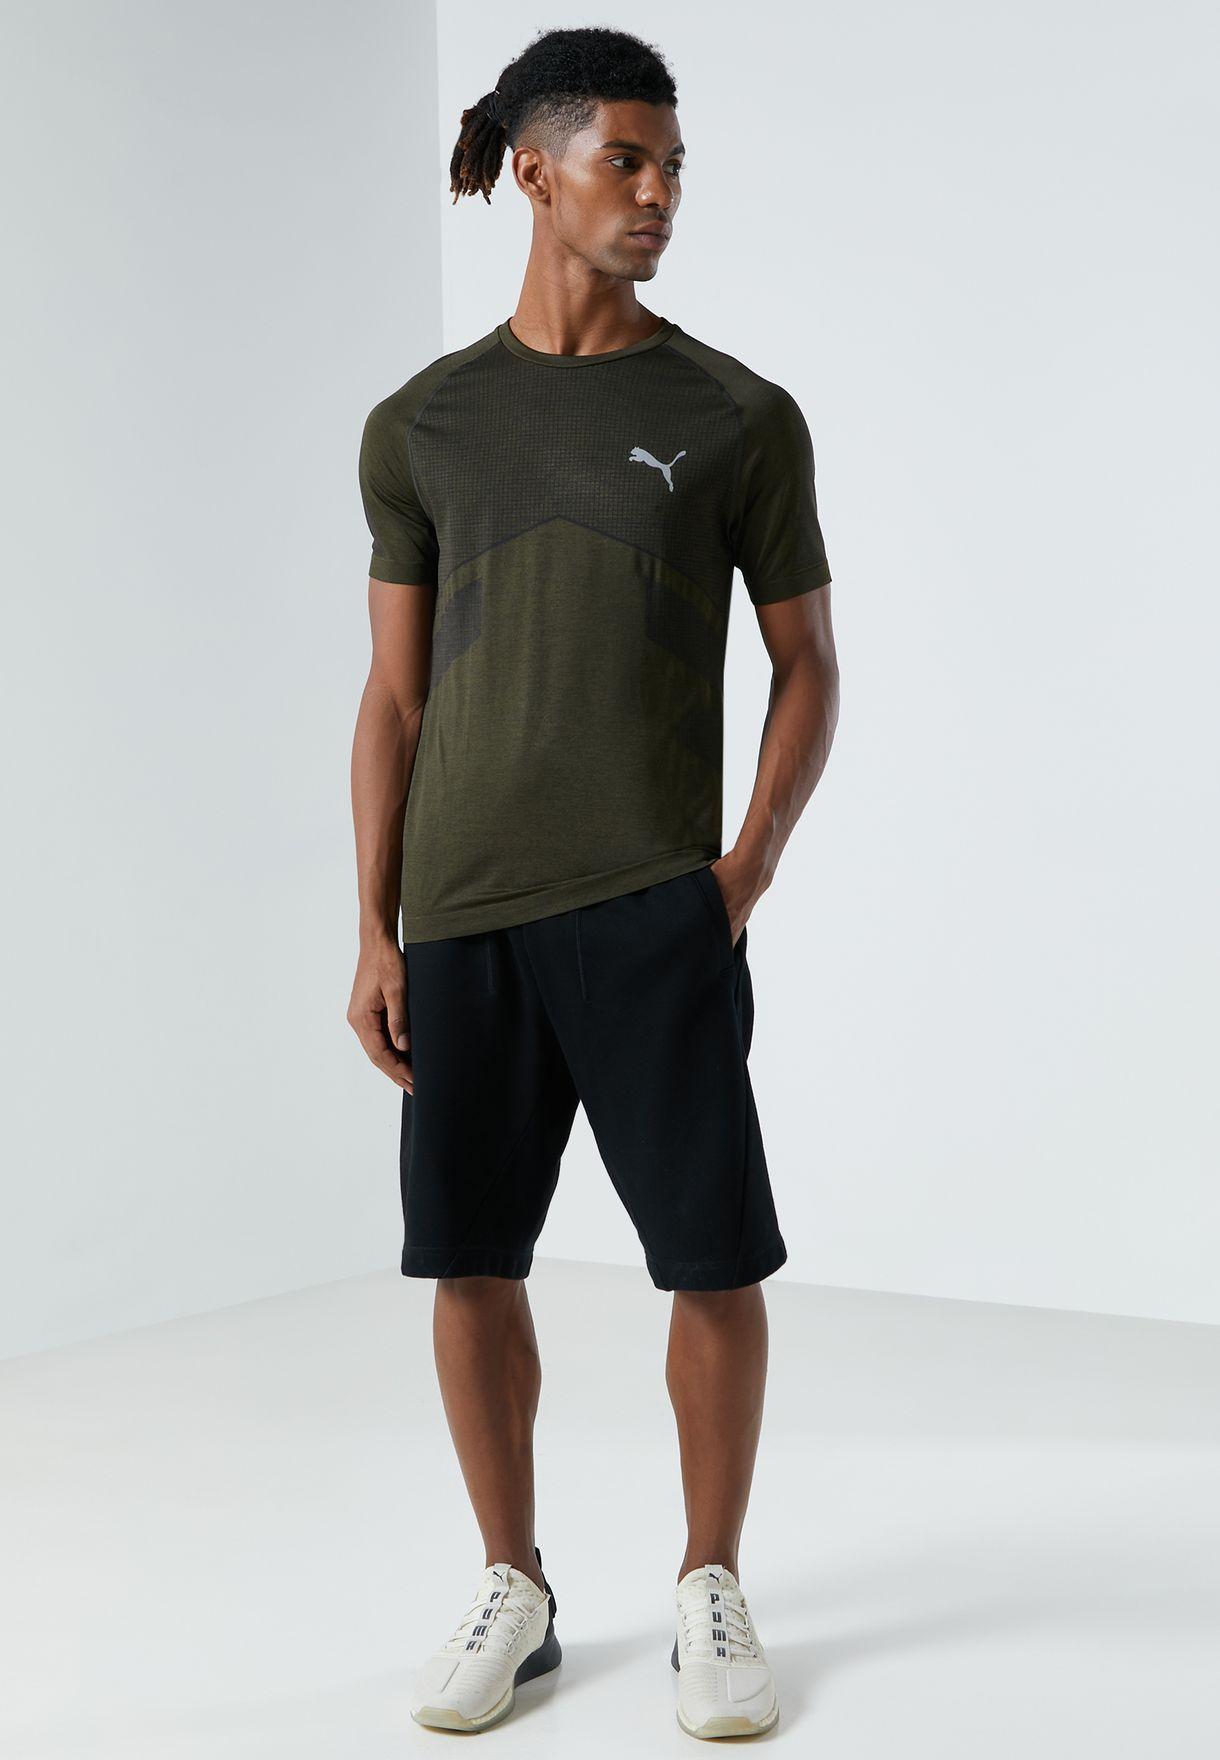 Evostripe Seamless T-Shirt